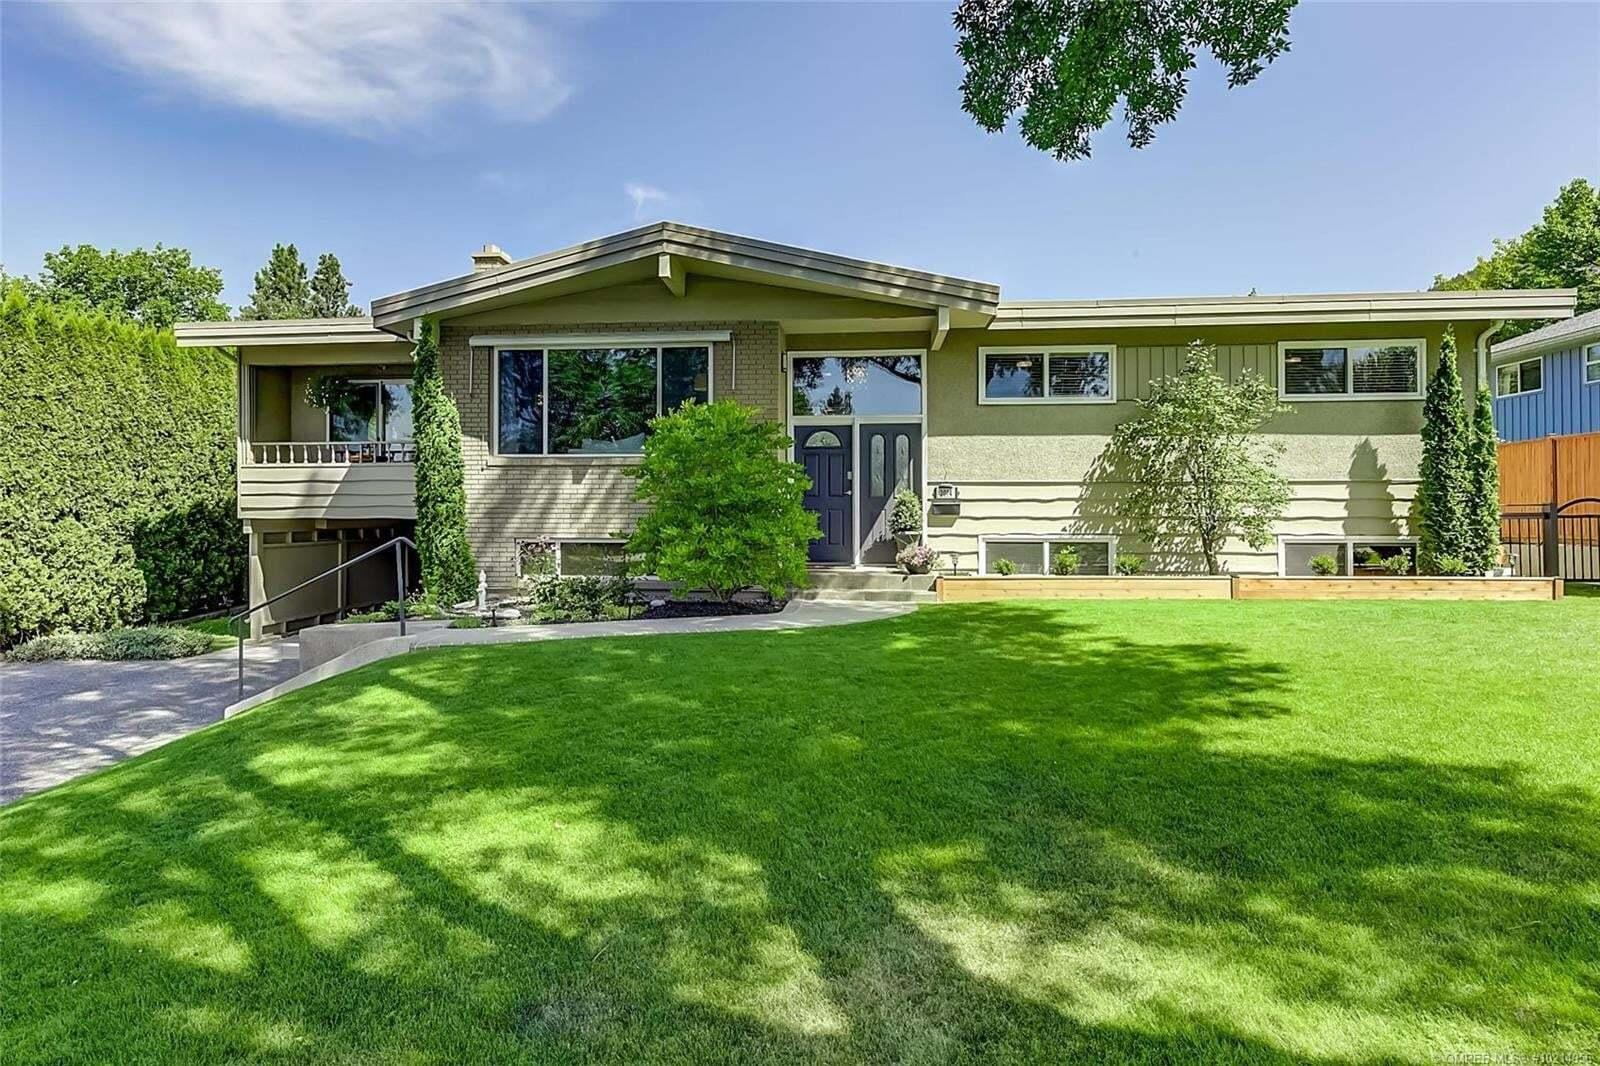 House for sale at 2014 St. Andrews Dr Kelowna British Columbia - MLS: 10214956